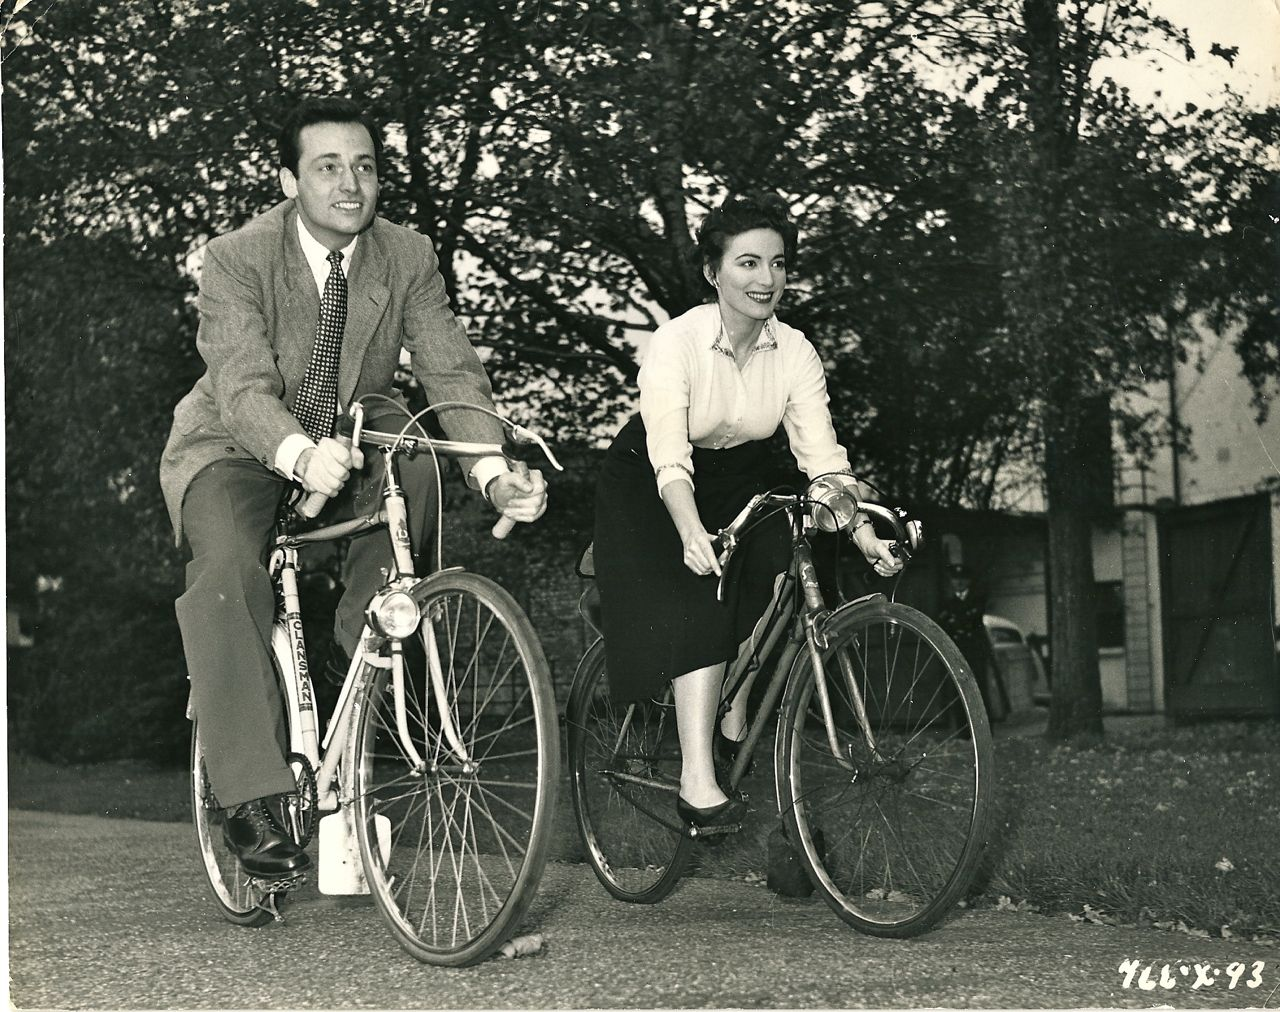 David Knight and Margo Lorenz montan en bici. (1955)